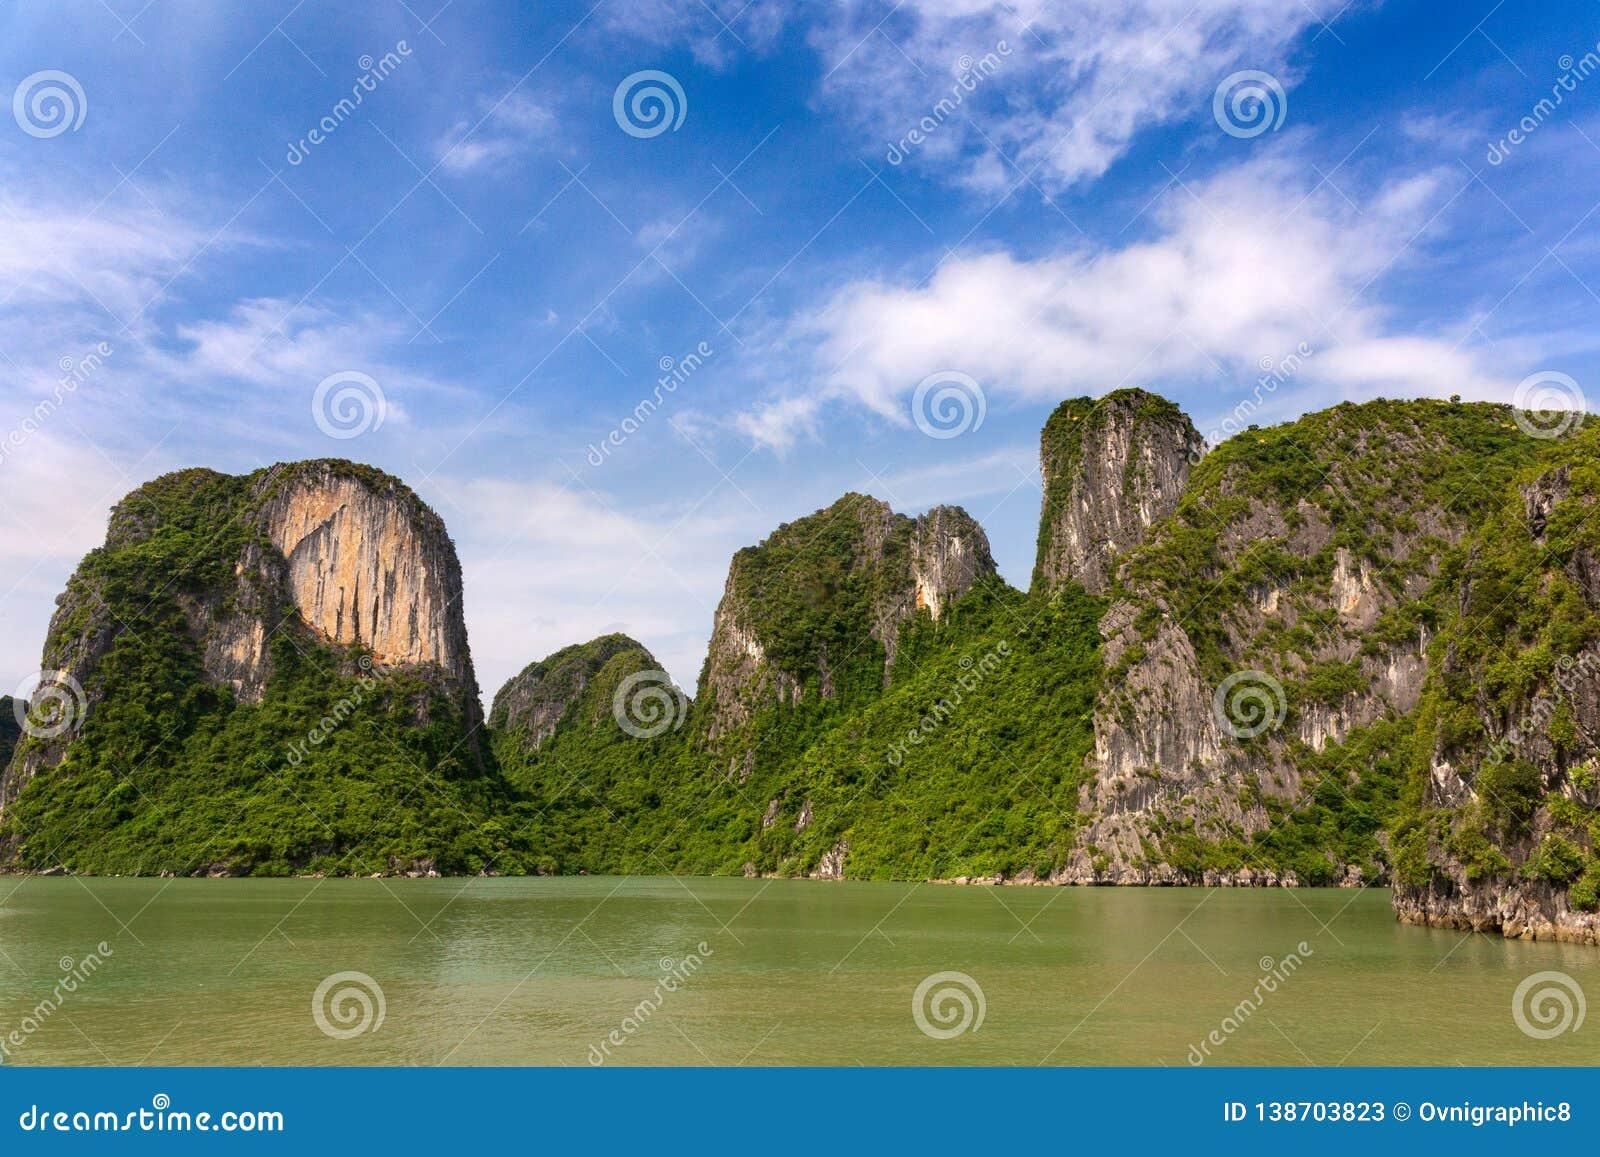 Halong Bay limestone formations, UNESCO world natural Heritage, Vietnam